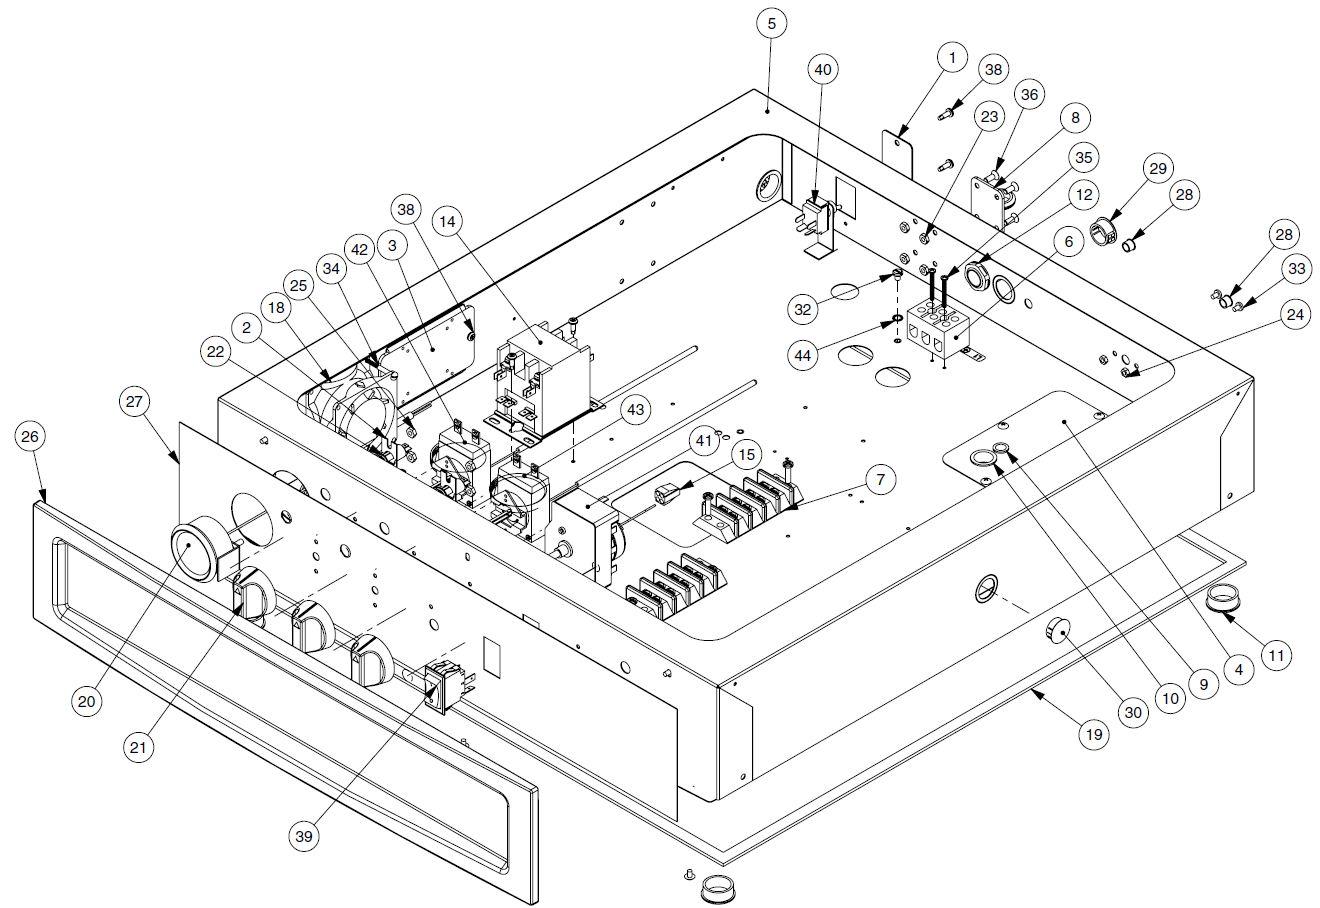 [QMVU_8575]  Alto Shaam 1000-TH-II Parts Diagram | Parts Town | Alto Shaam Wiring Diagram |  | Parts Town